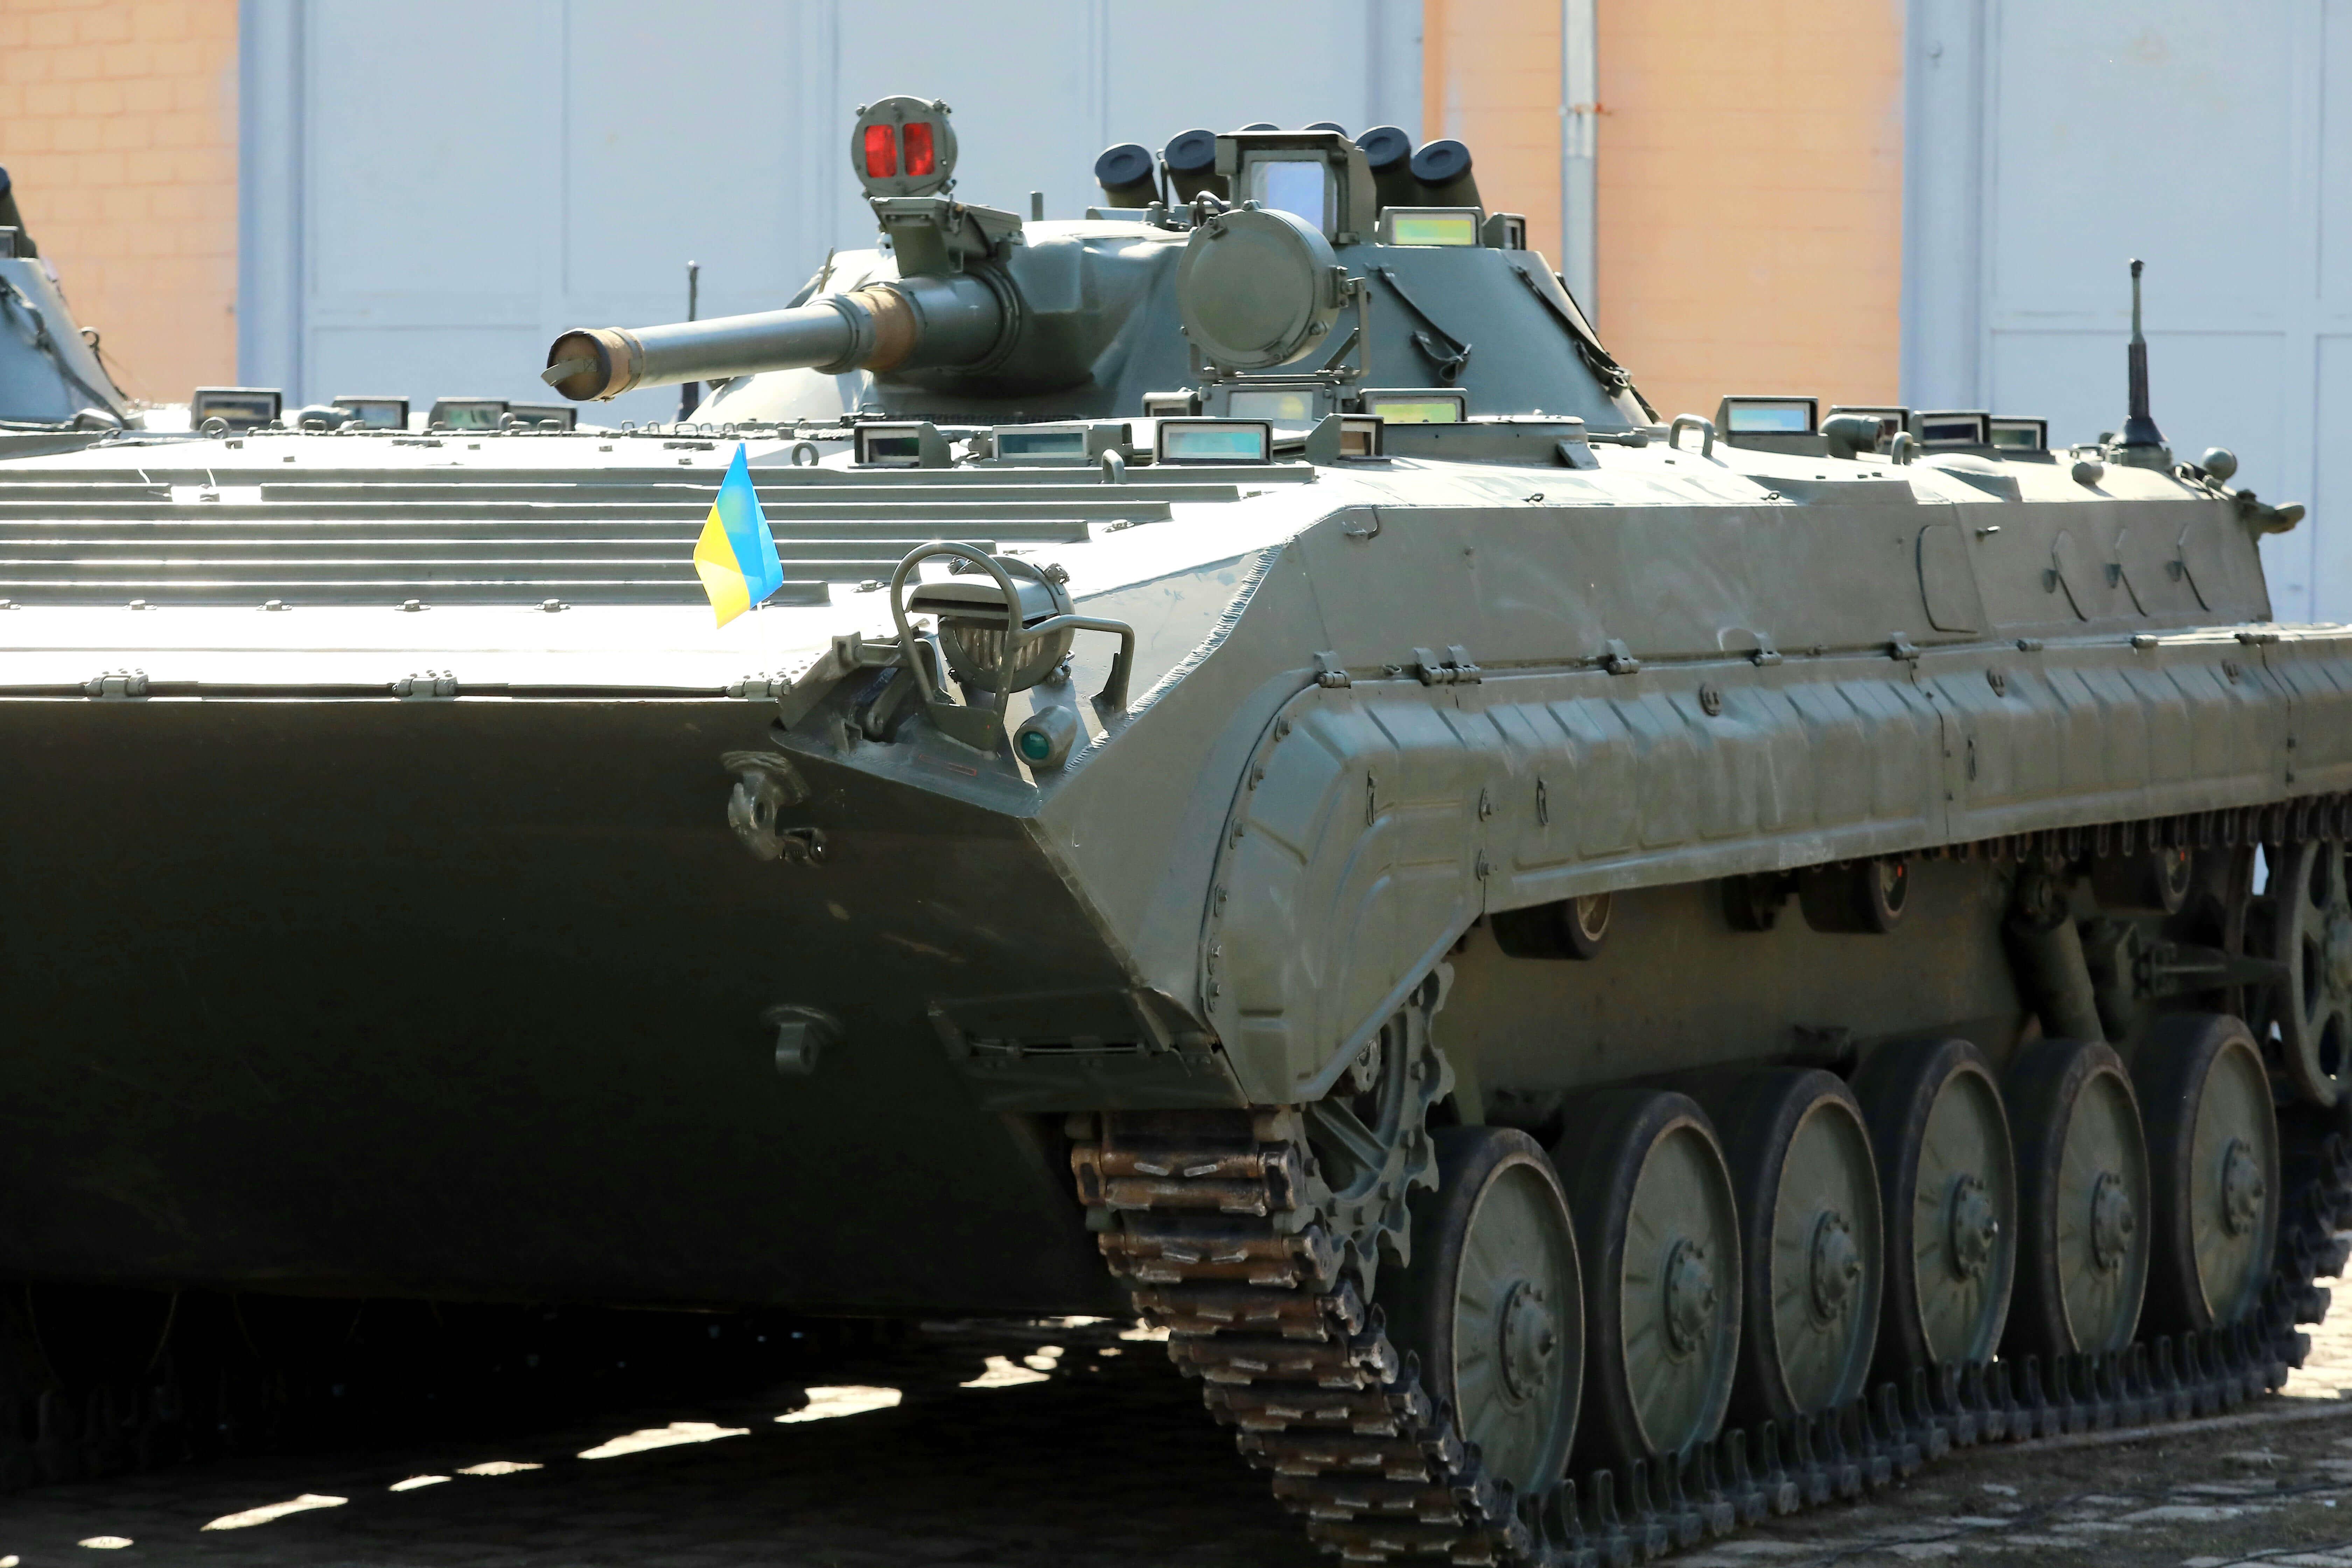 Volodymyr Tarasov/Globallookpress.com